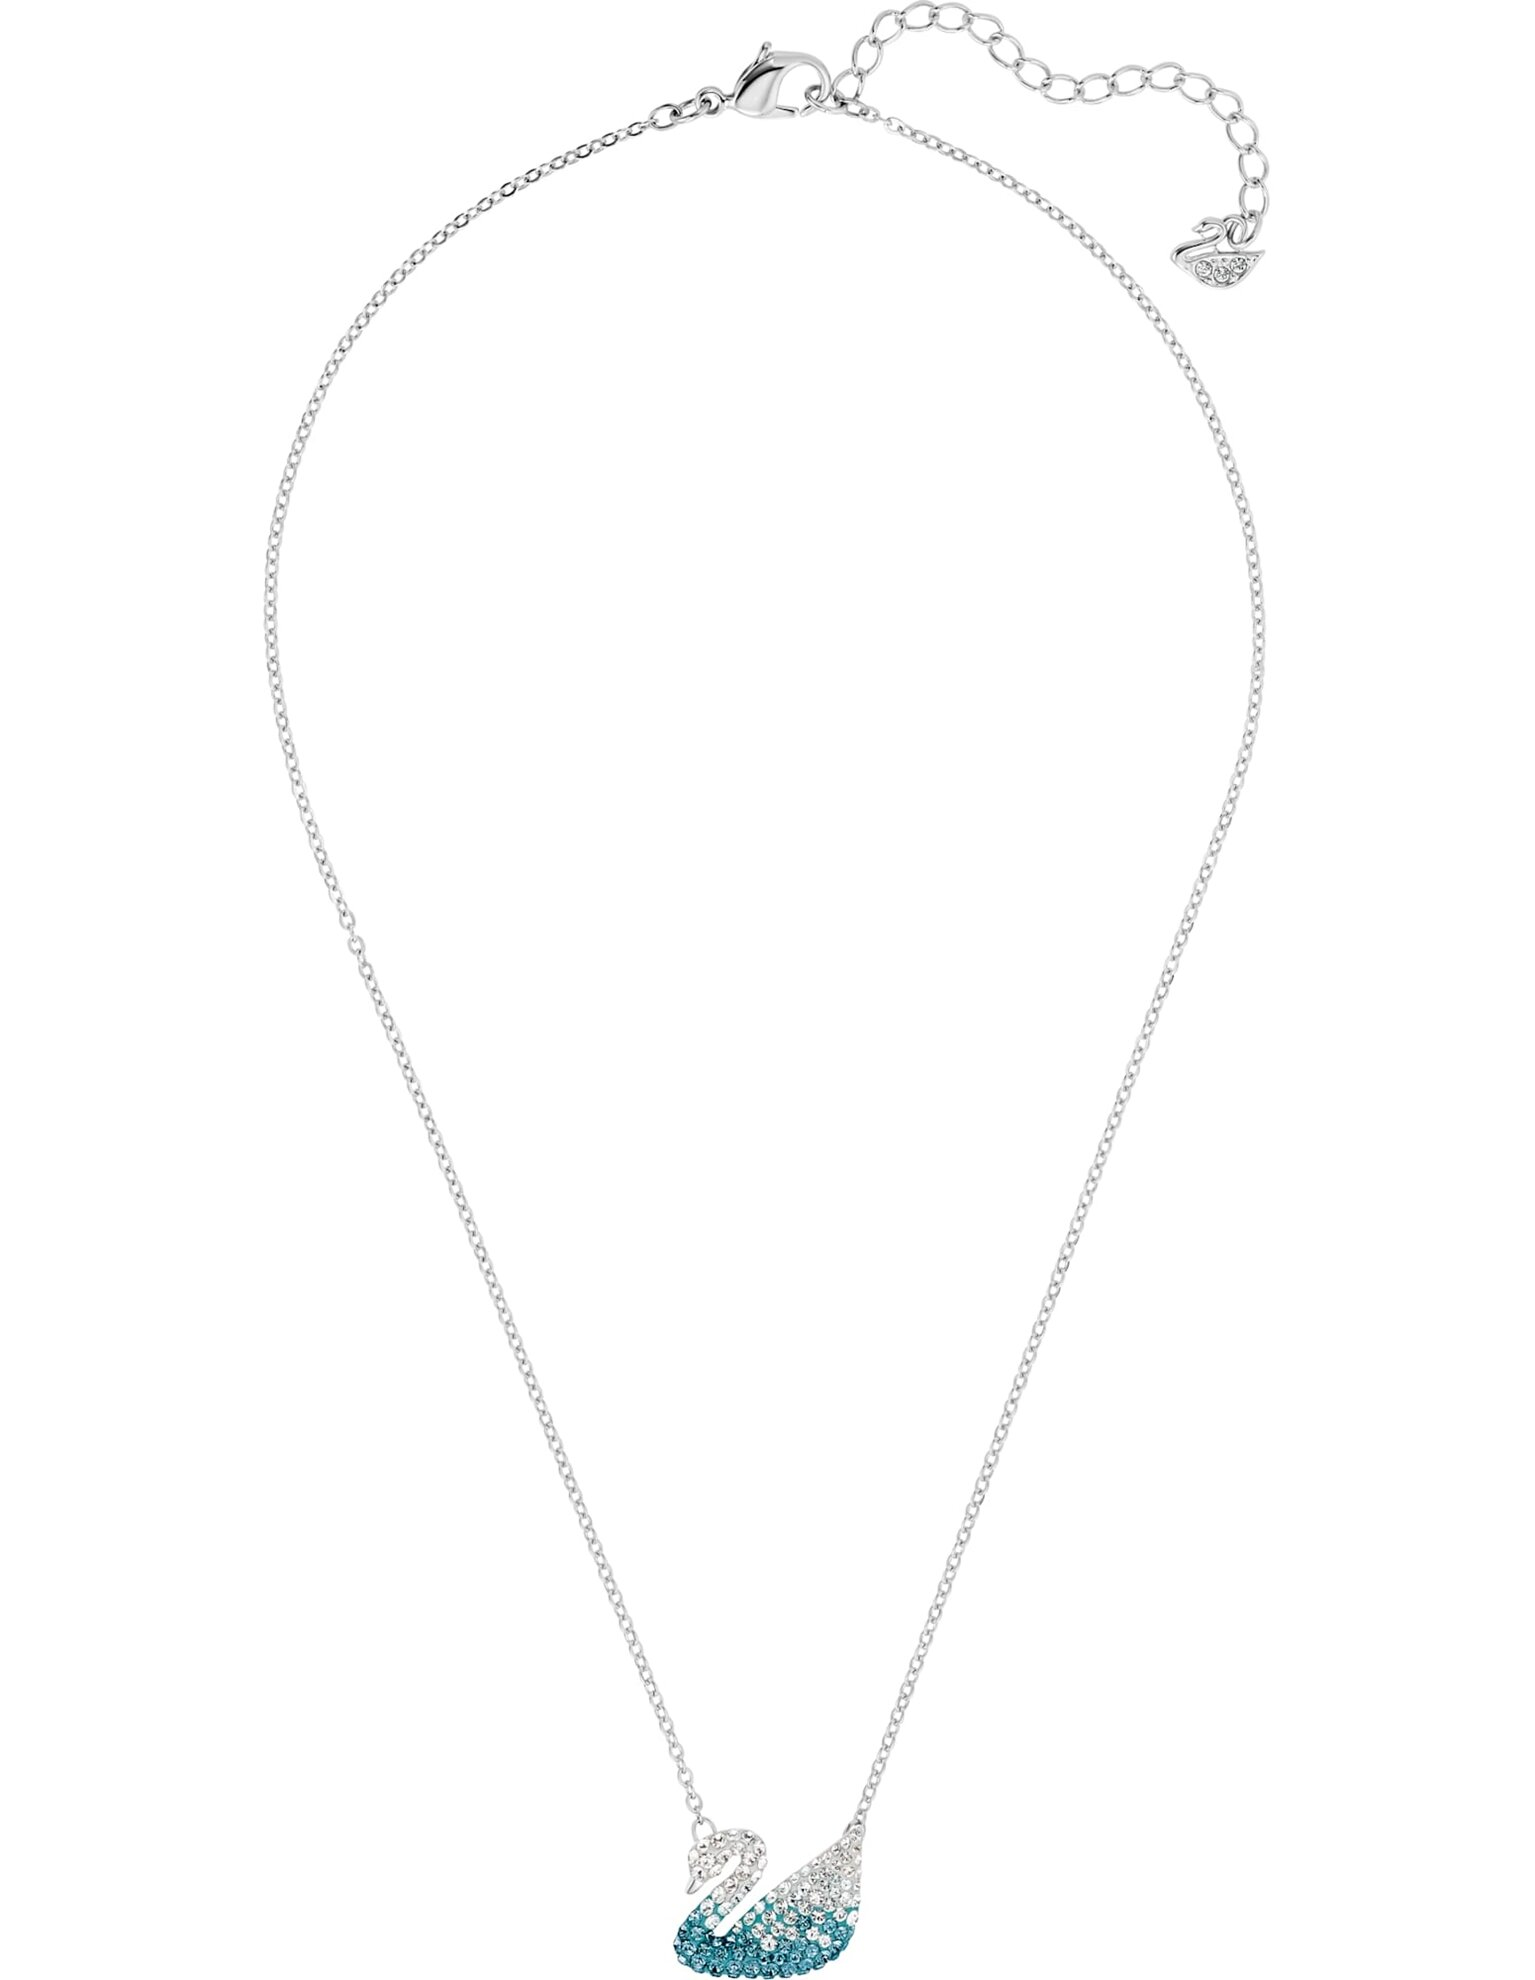 Picture of Swarovski Iconic Swan kolye, Cok Renkli, Rodyum kaplama